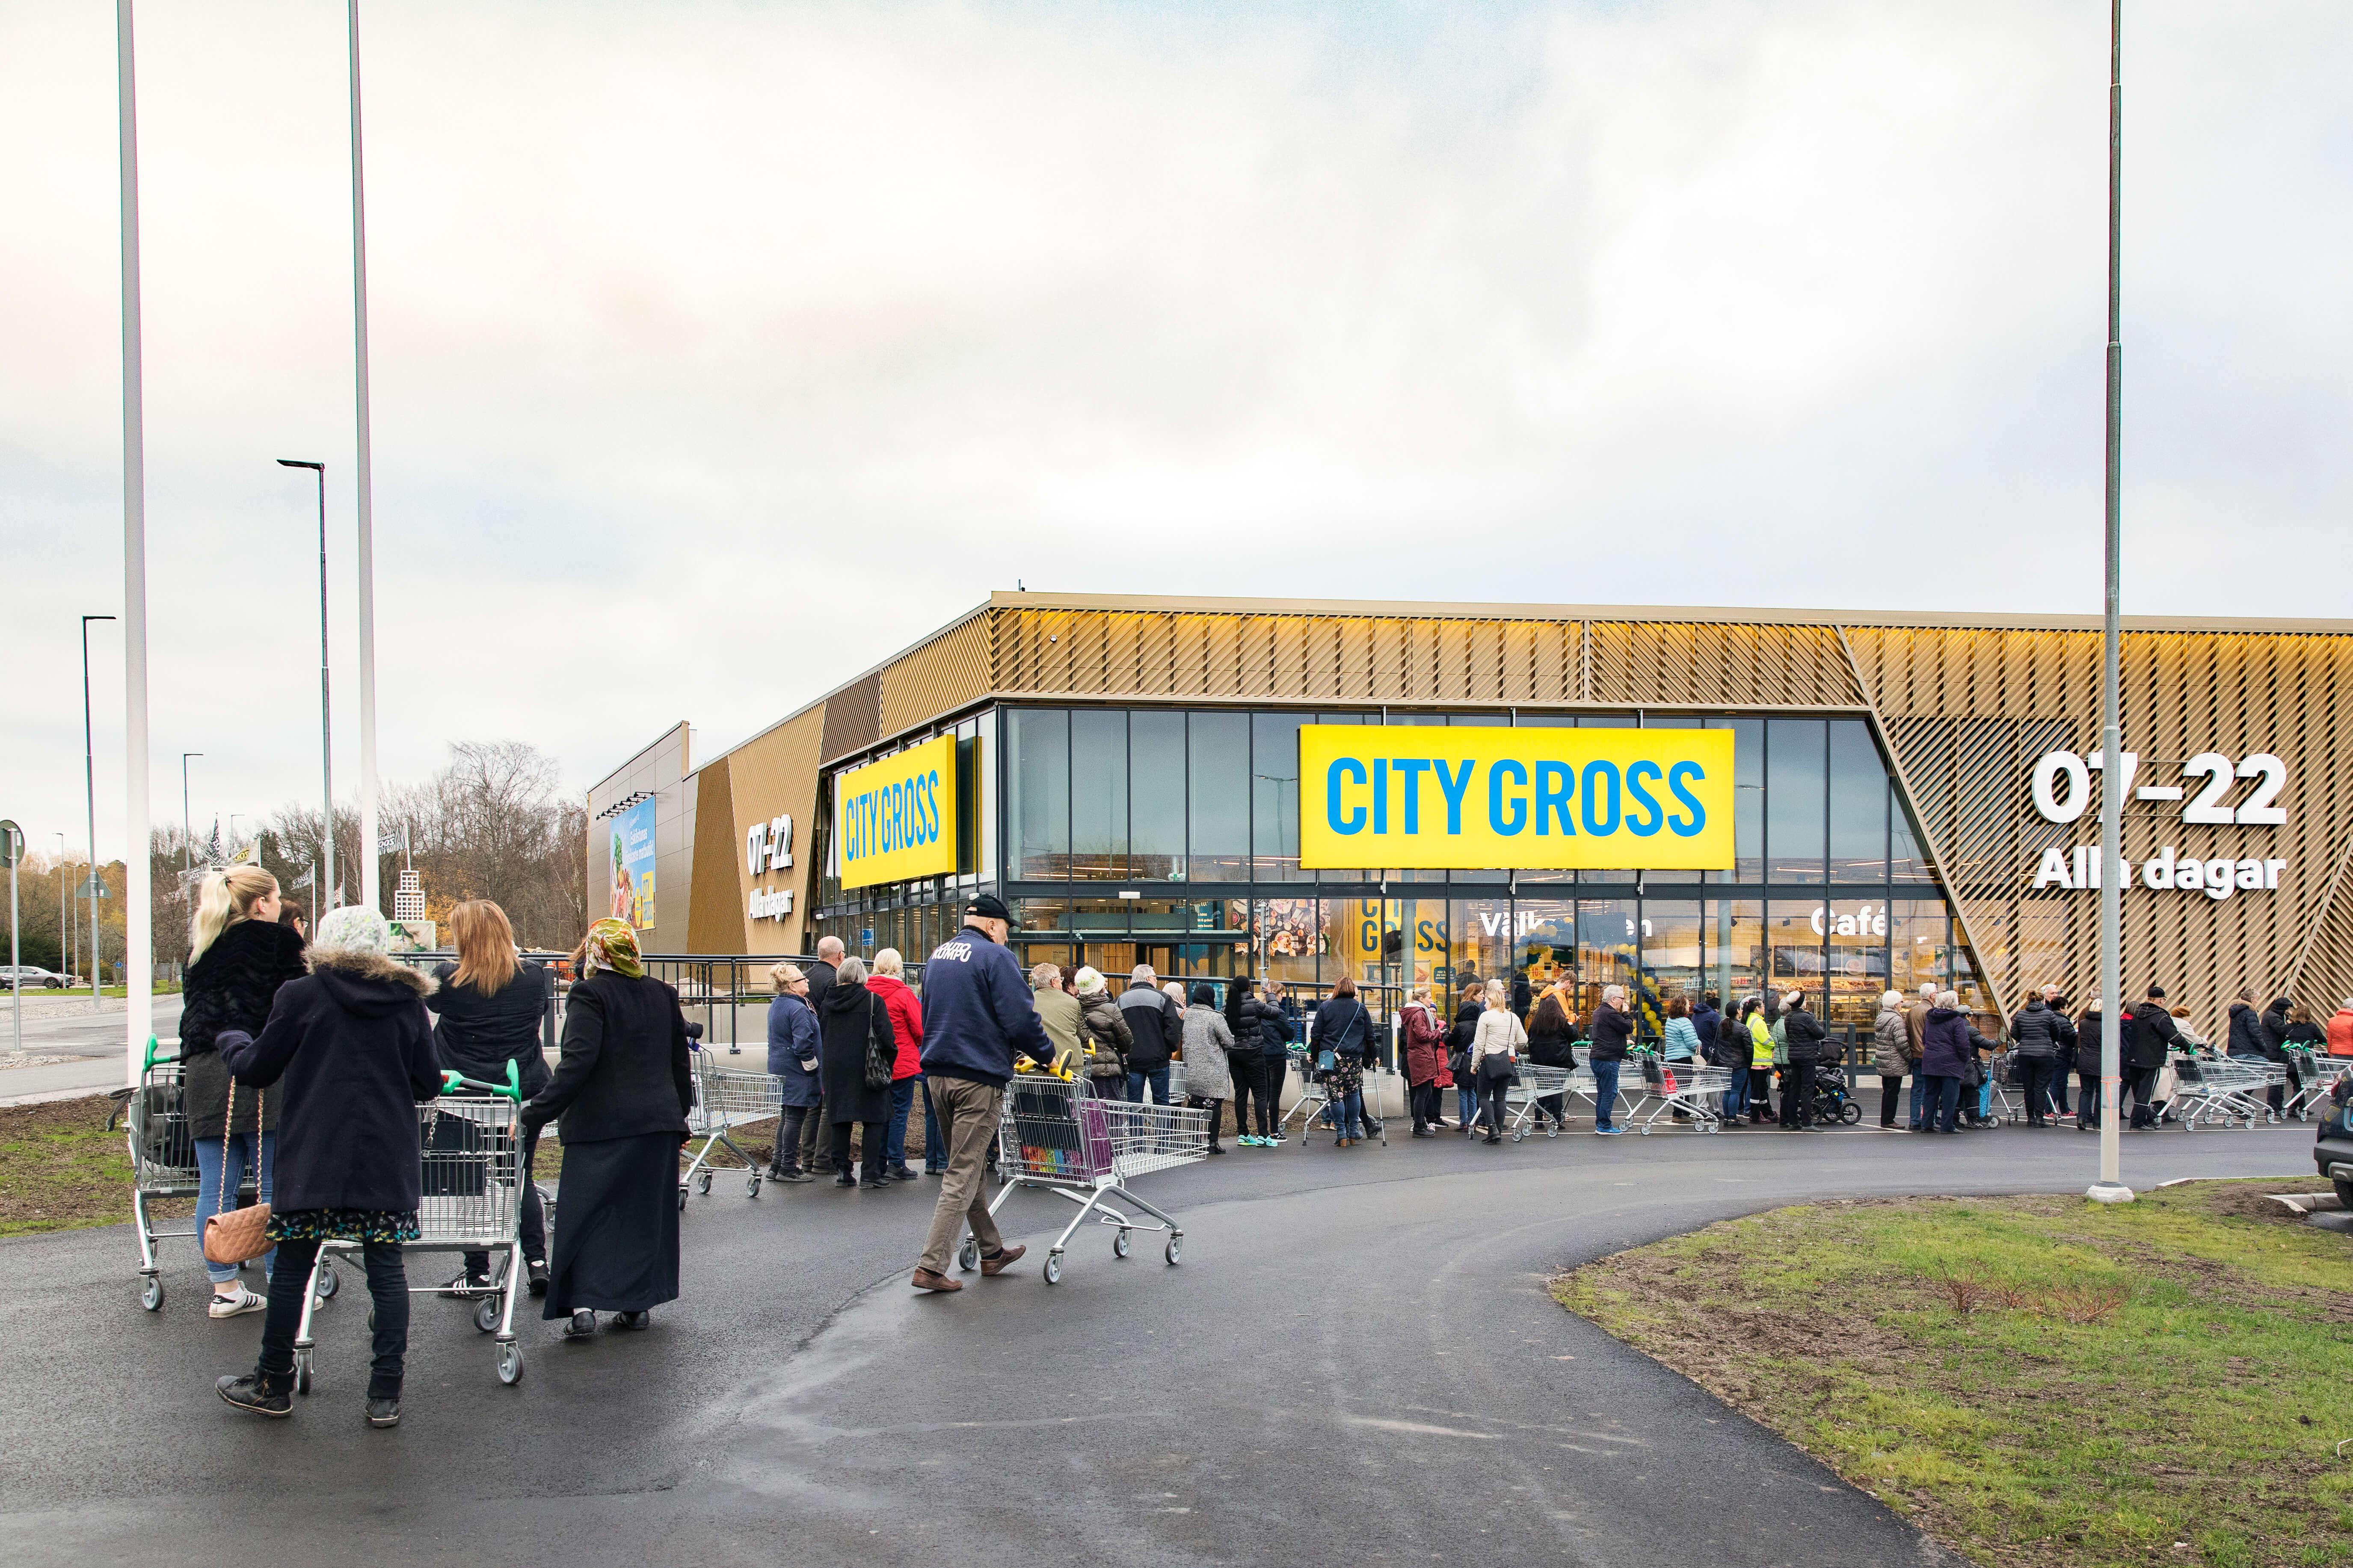 Photo of City Gross